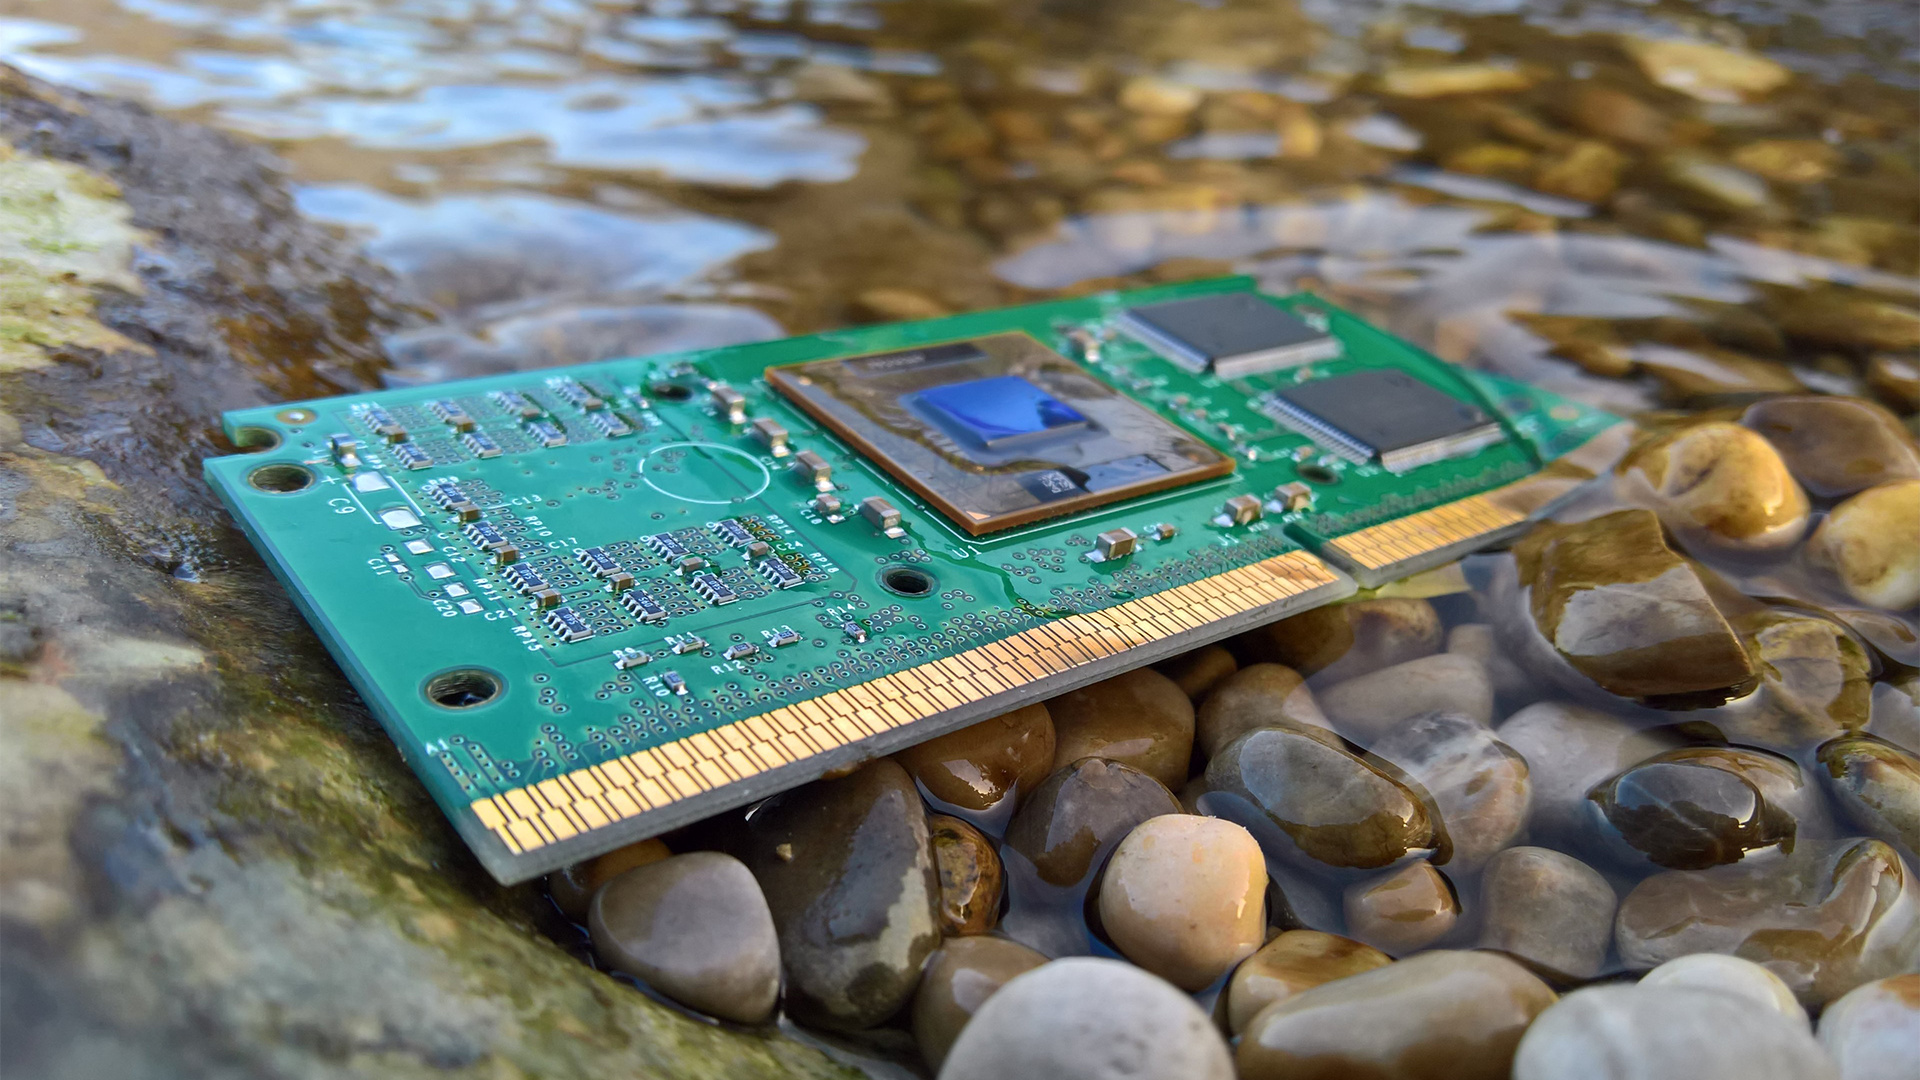 Ein Intel Pentium III